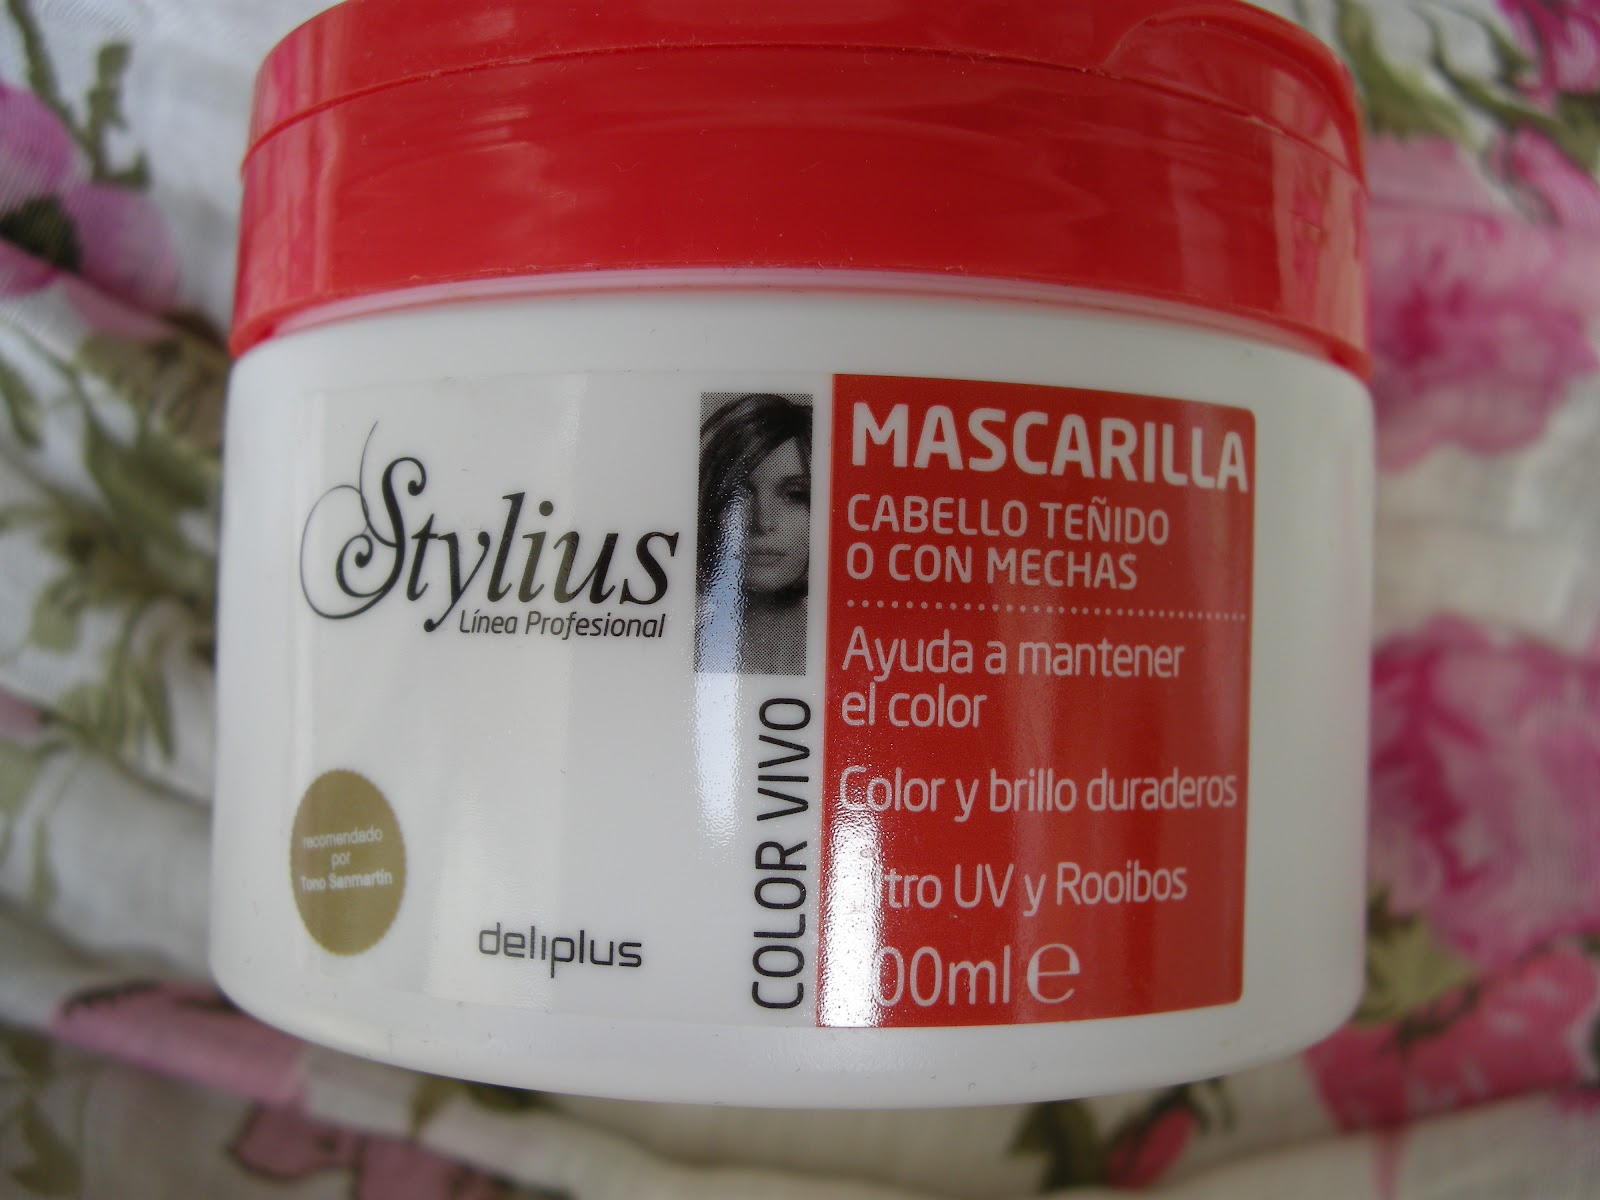 Deliplus mi rinconcito de maquillaje for Bano de color mercadona